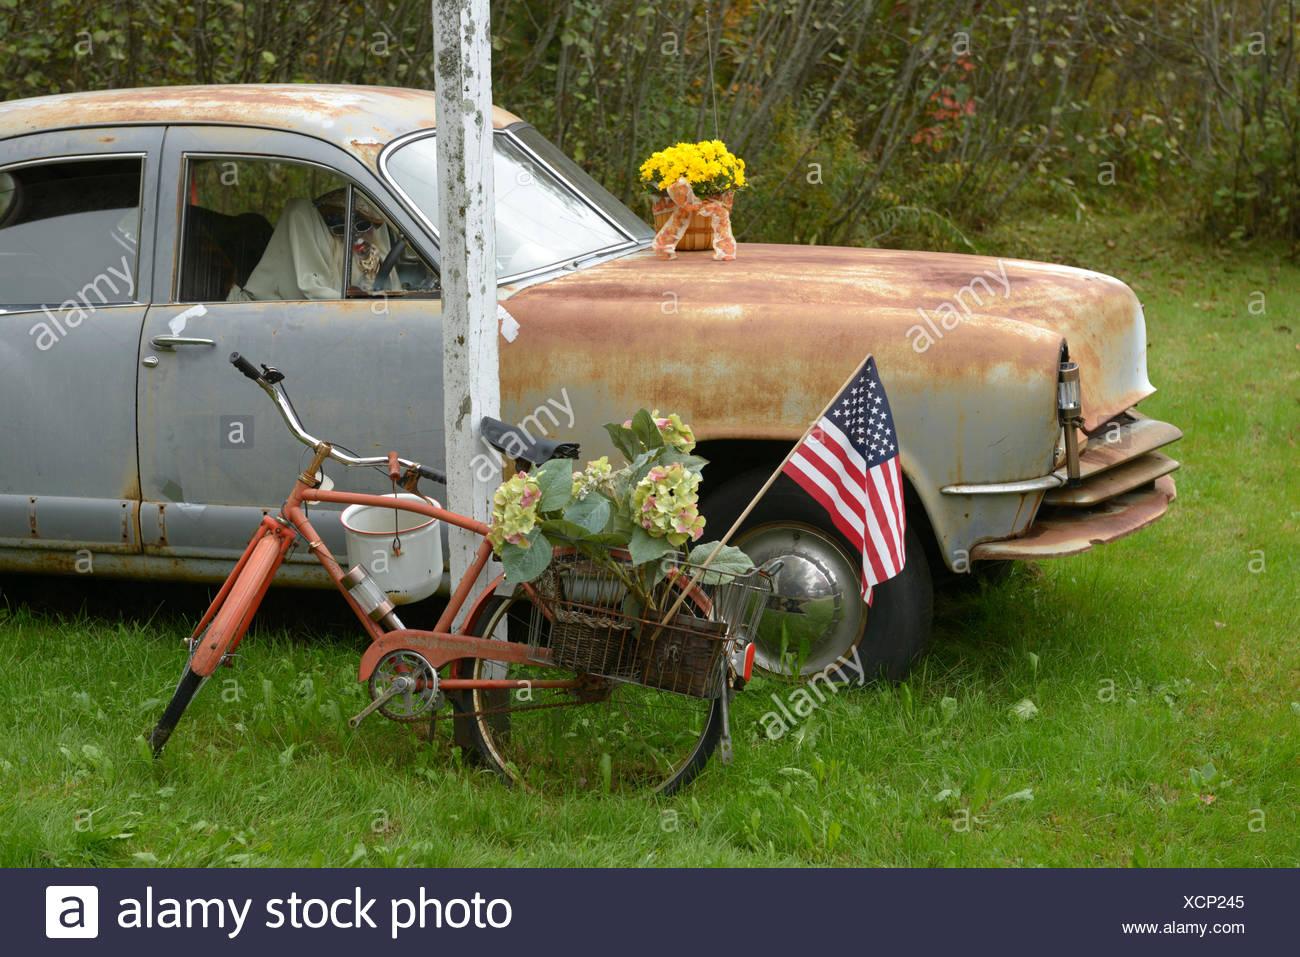 Old, Car, rusty, Lisbon Falls, Androscoggin County, Maine, New England, East Coast, USA, United States, America, - Stock Image